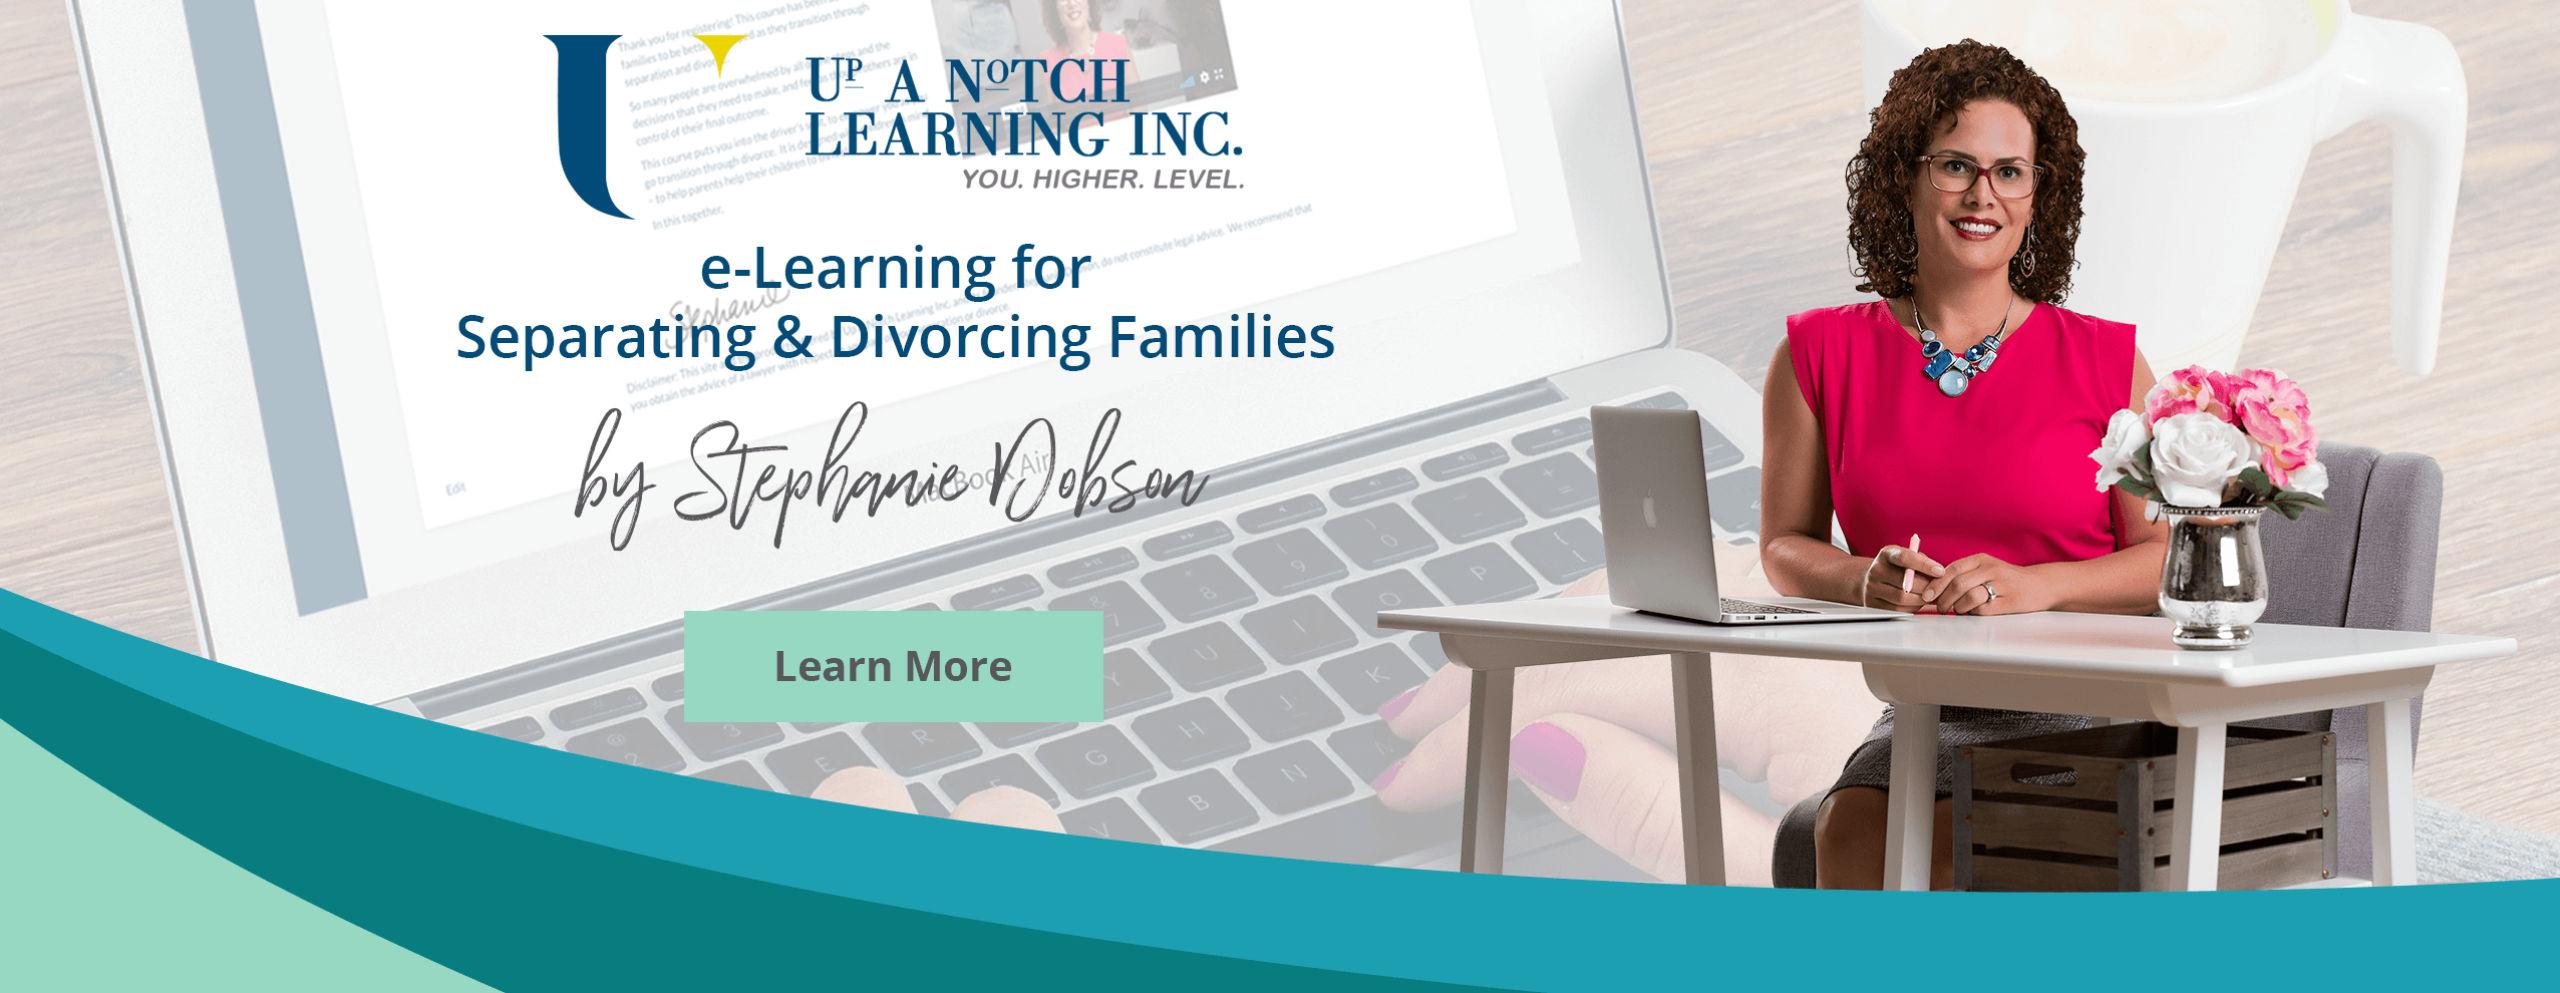 E-Learning Community